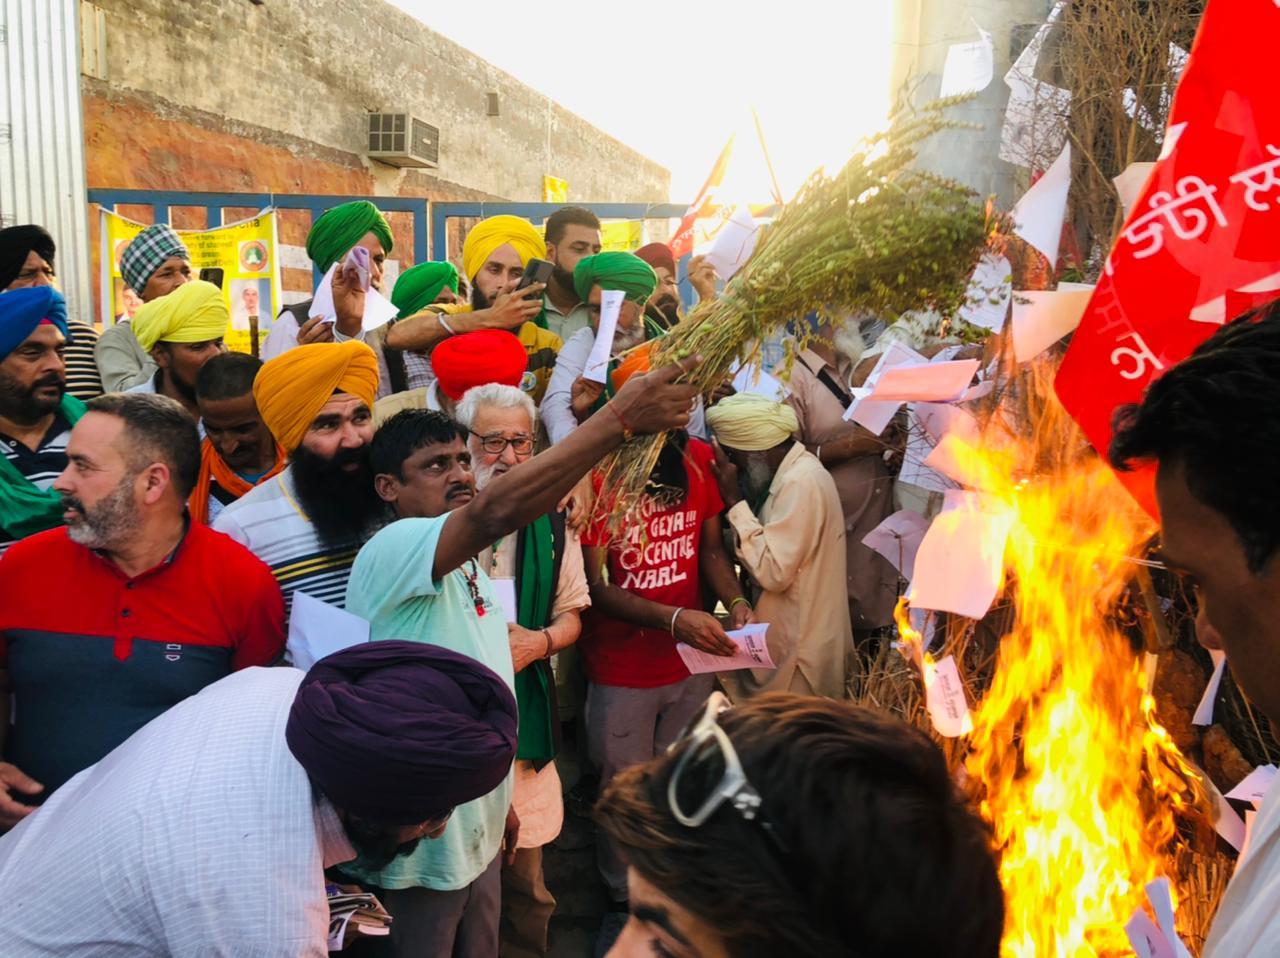 Farmers Holi: Farmers burnt copies of farm laws on 'Holika Dahan'. Rakesh Tikait said they will celebrate Holi at border.